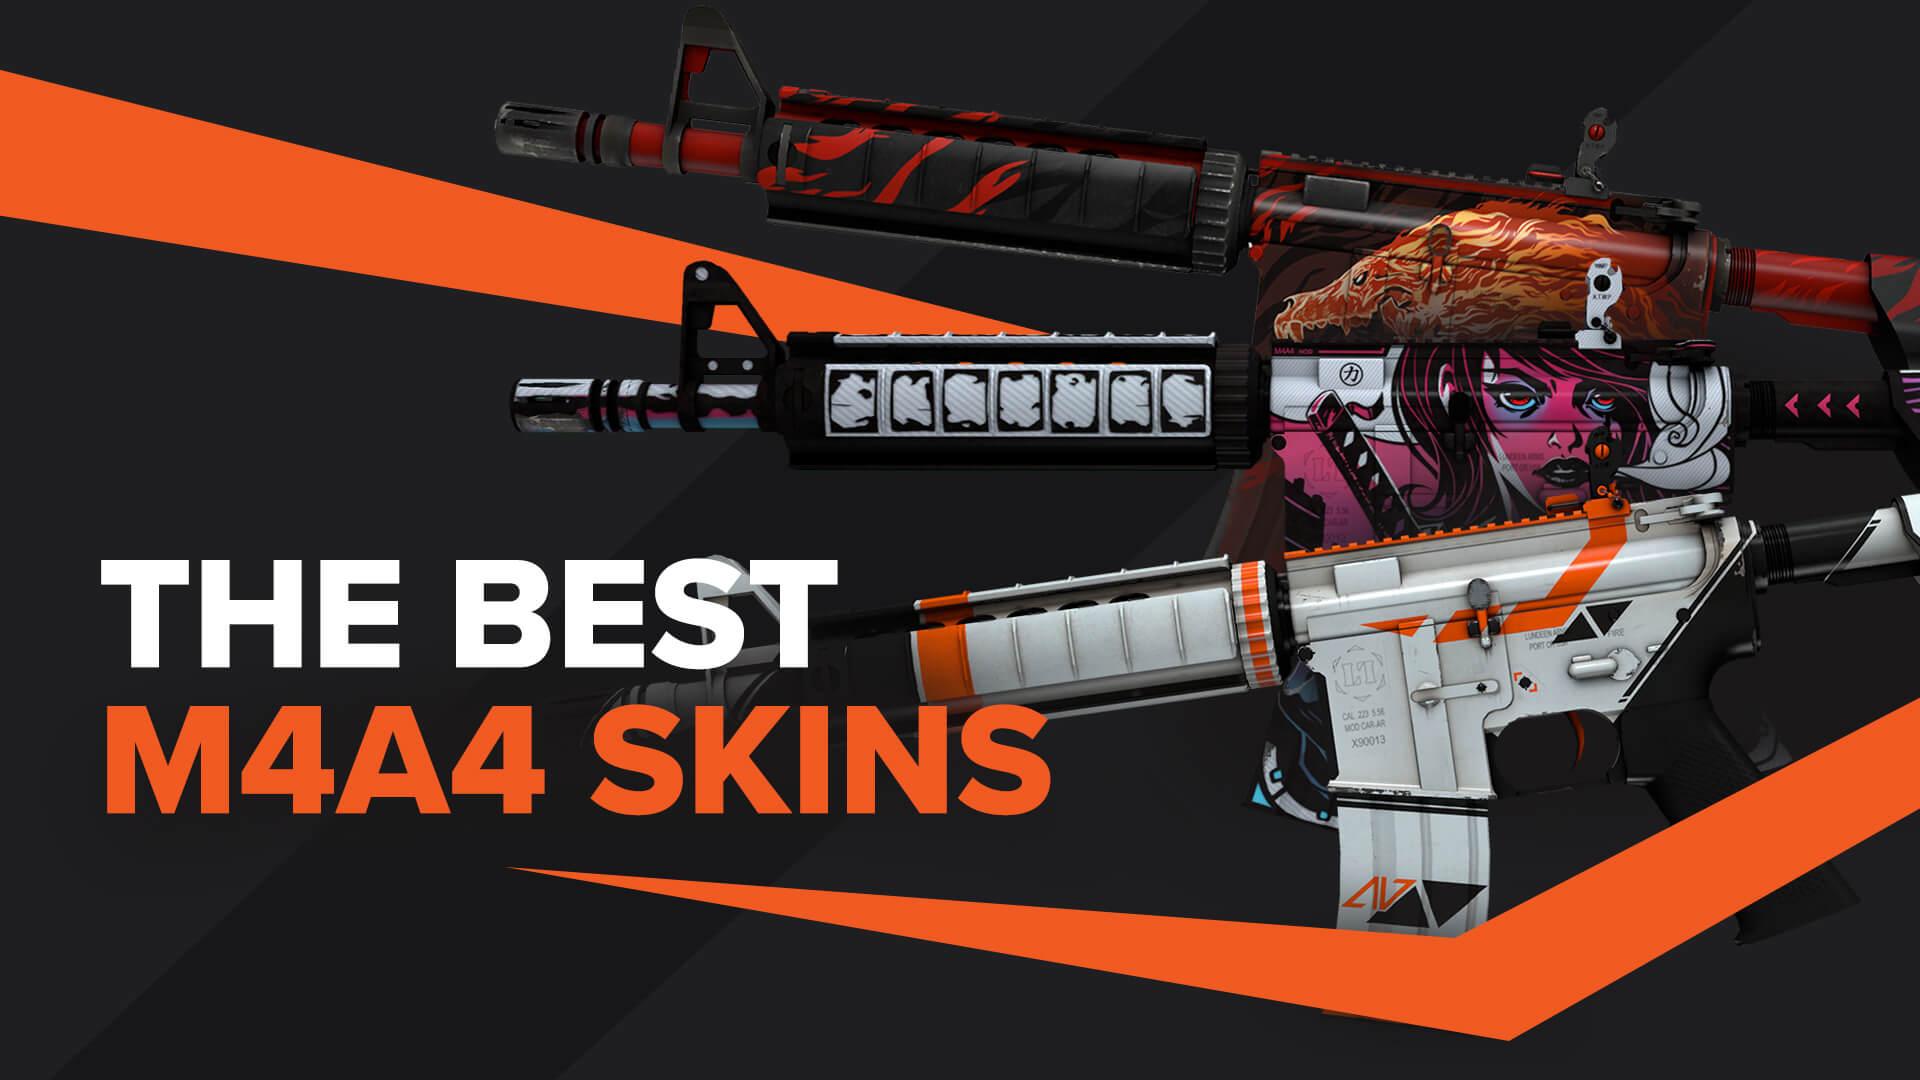 best M4a4 skins CSGO